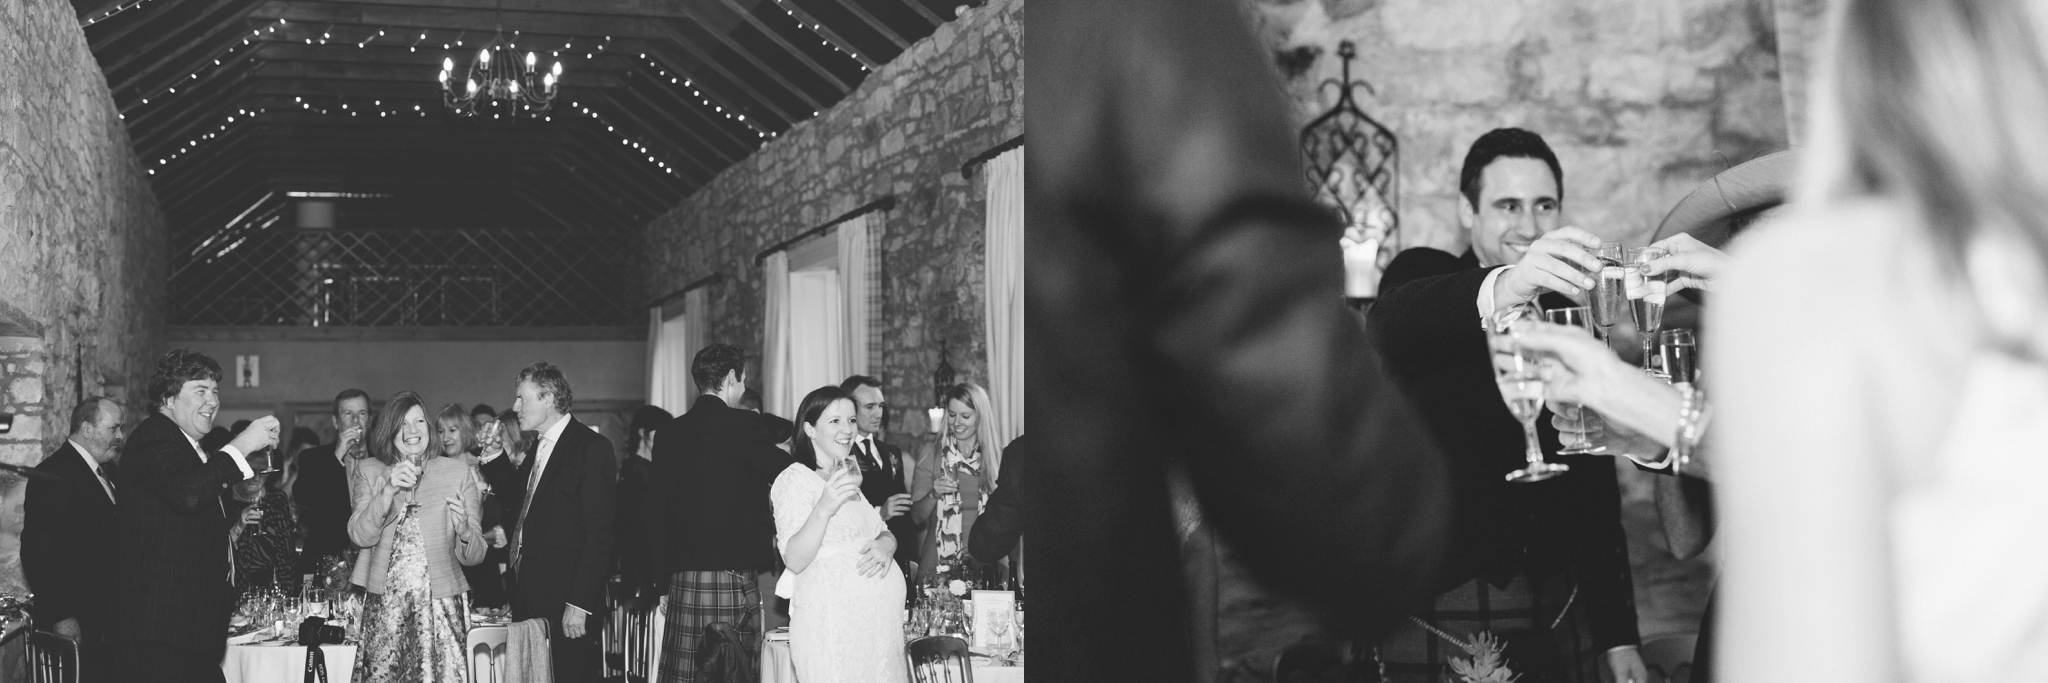 Suzanne_li_photography_kirknewton_wedding_0062.jpg